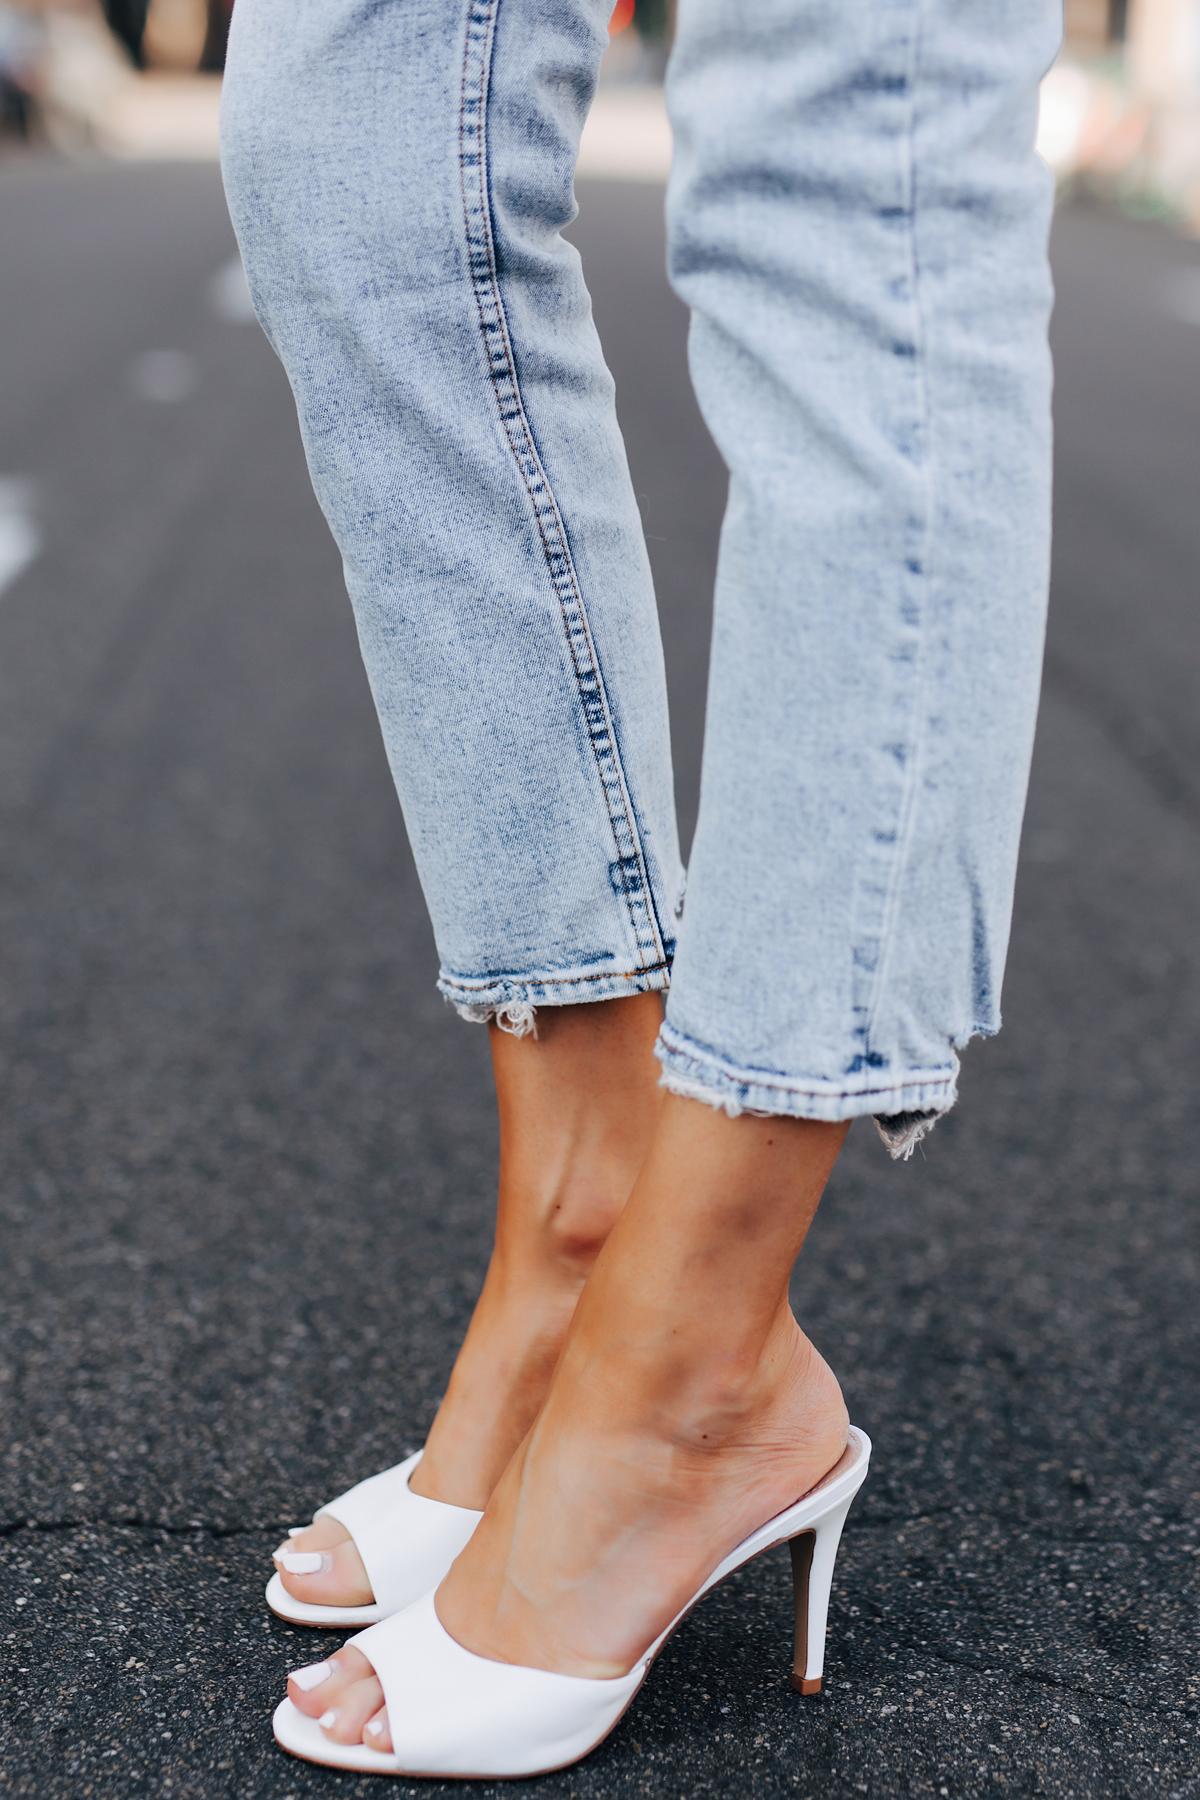 Fashion Jackson Wearing Abercrombie Straight Leg Jeans Steve Madden Erin White Leather Heels